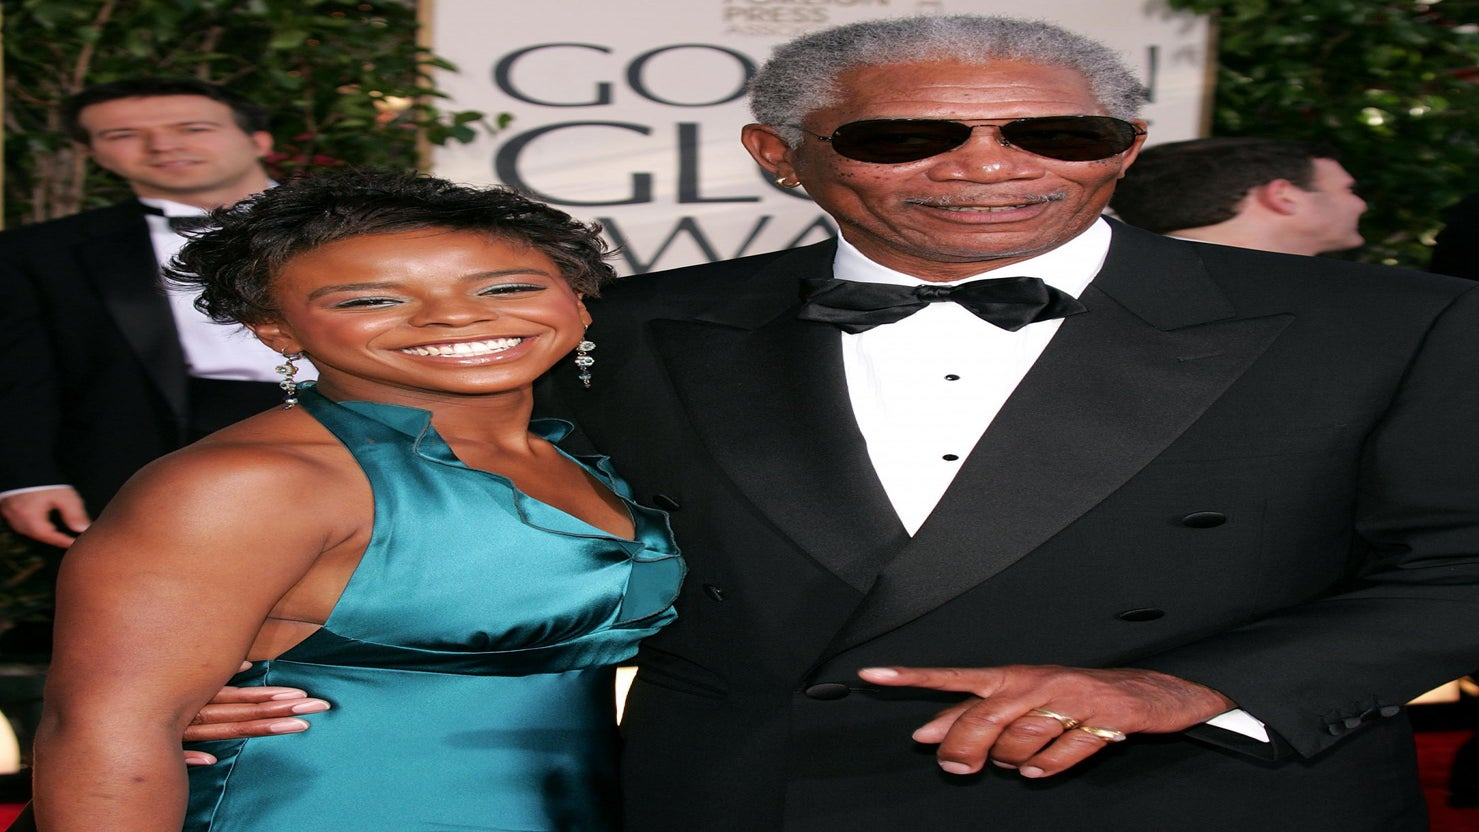 Man Who Killed Morgan Freeman's Granddaughter Pleads Not Guilty